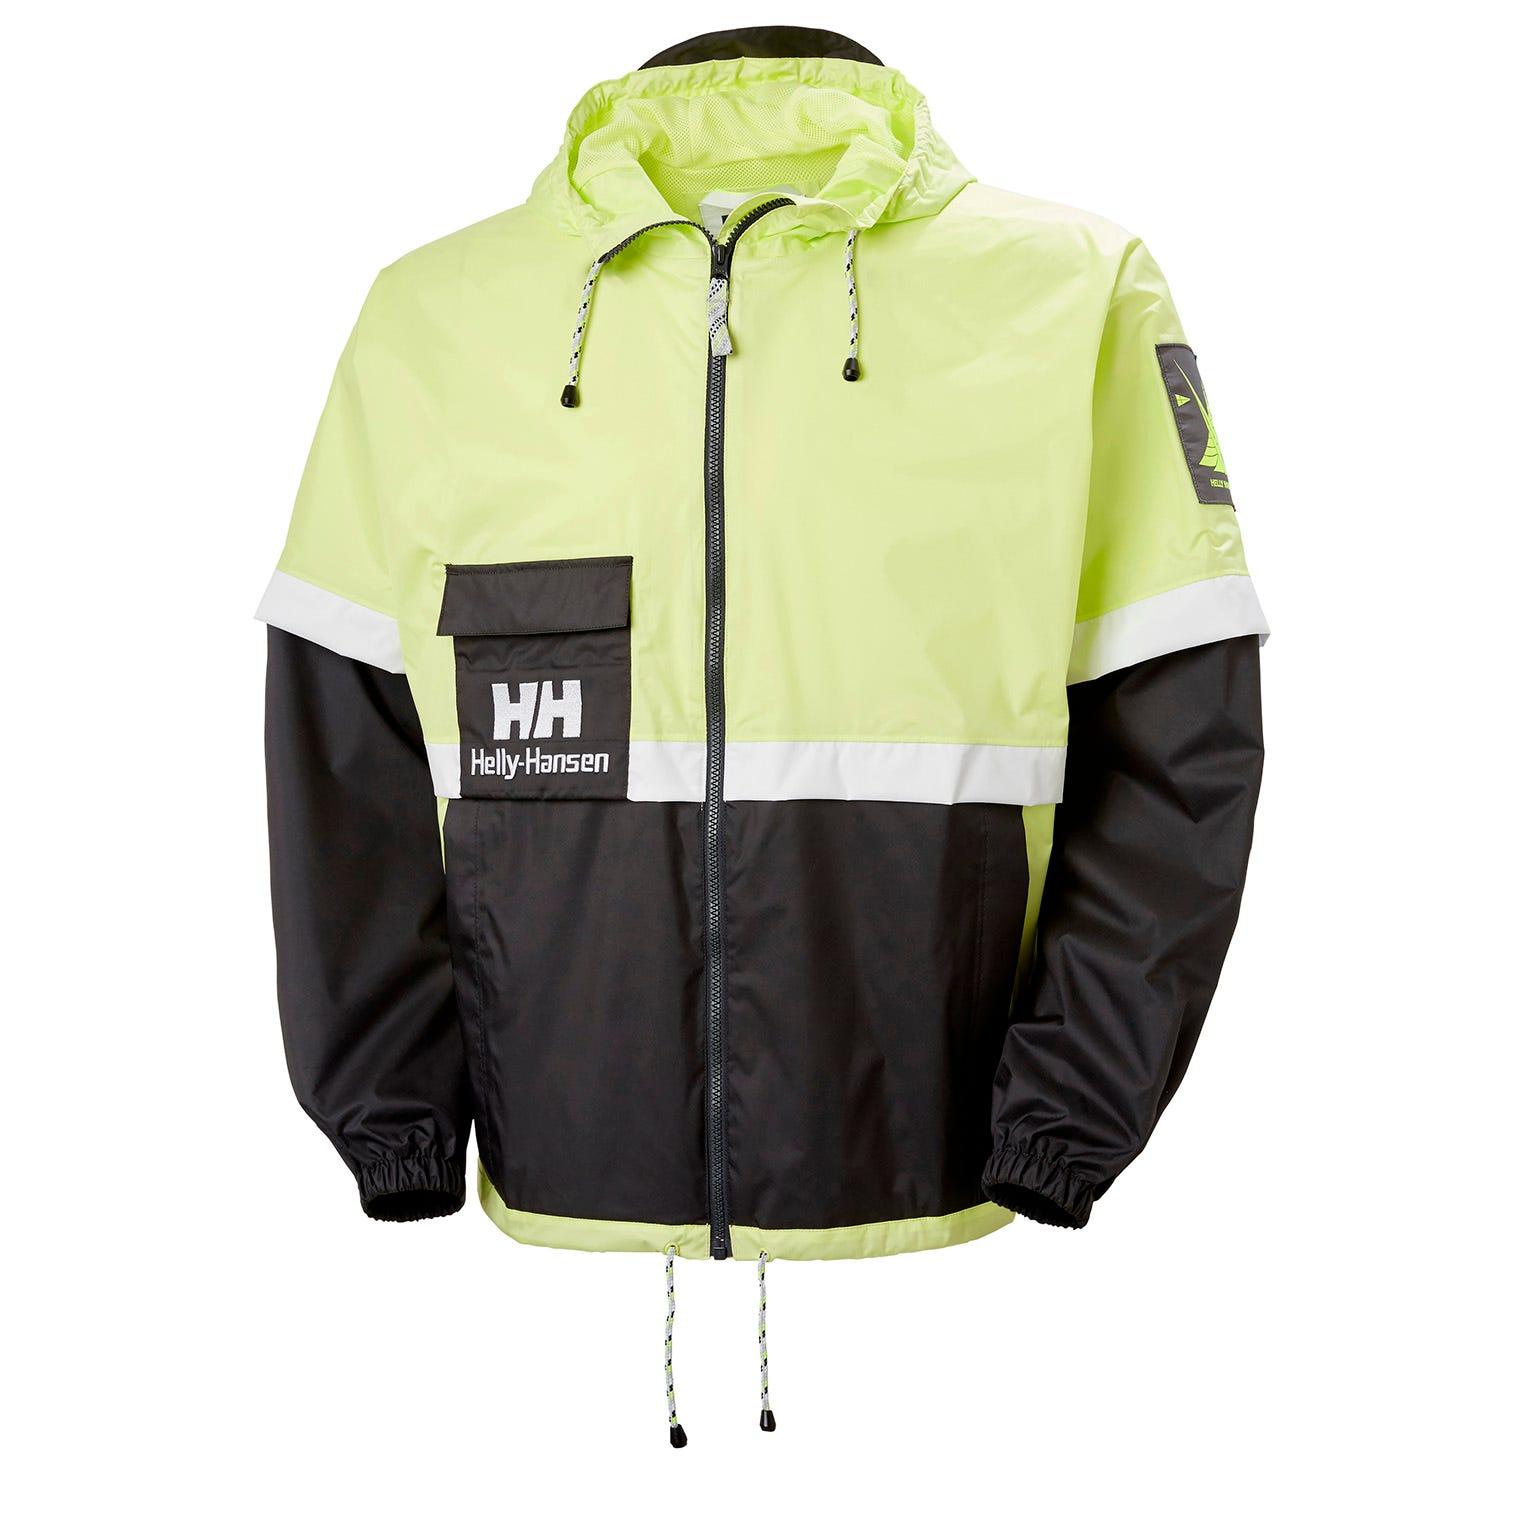 Helly Hansen Mens Yu20 Fully Waterproof Rain Jacket Green S